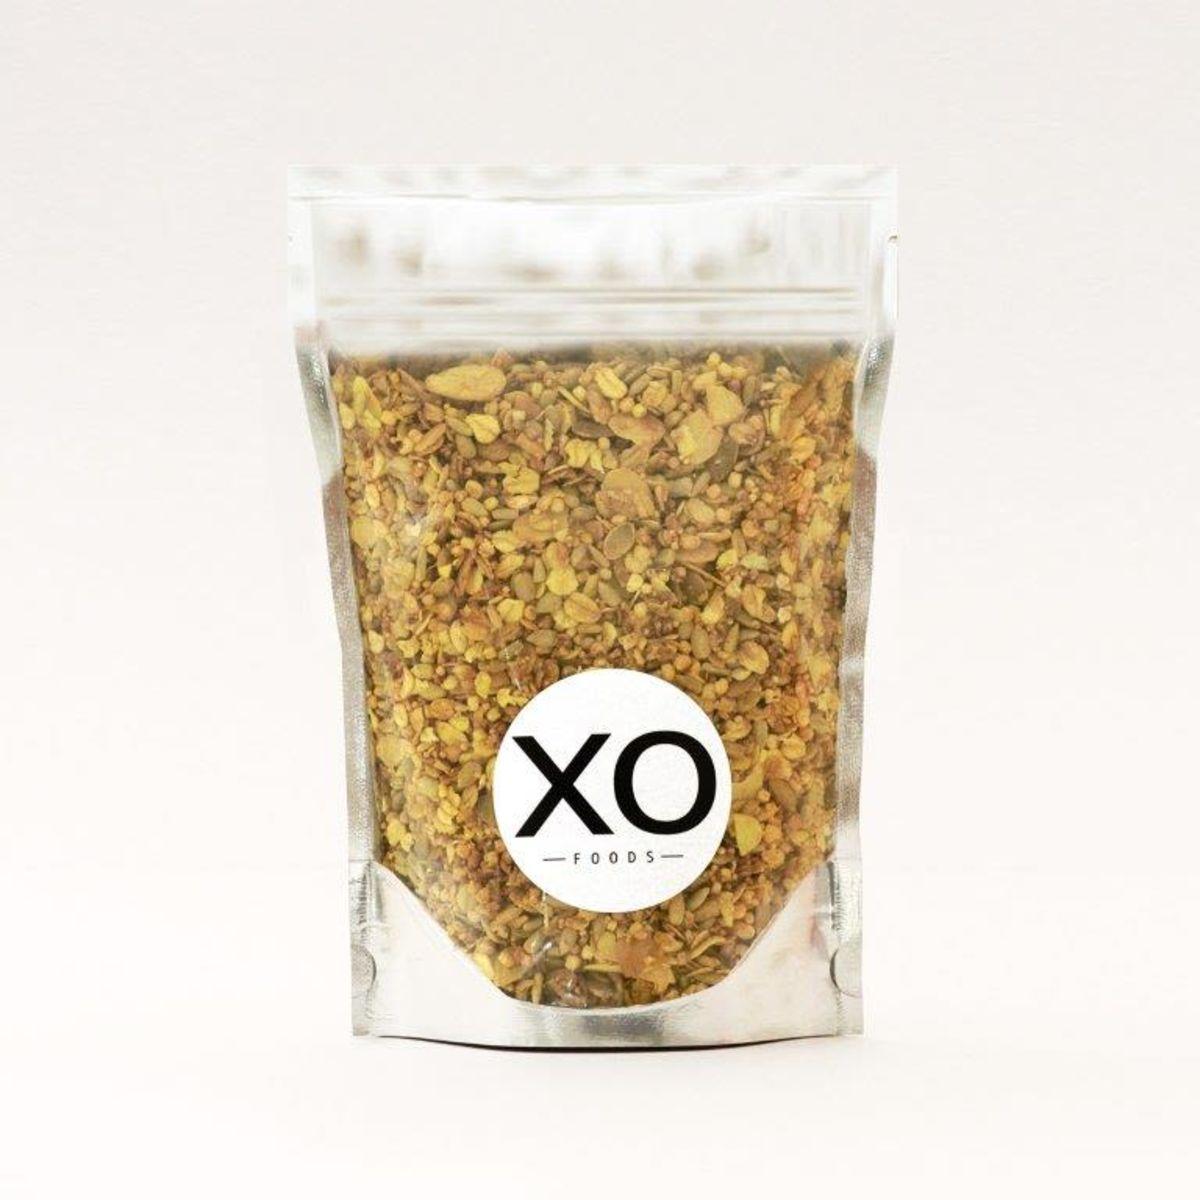 XO Foods - Golden Moozly